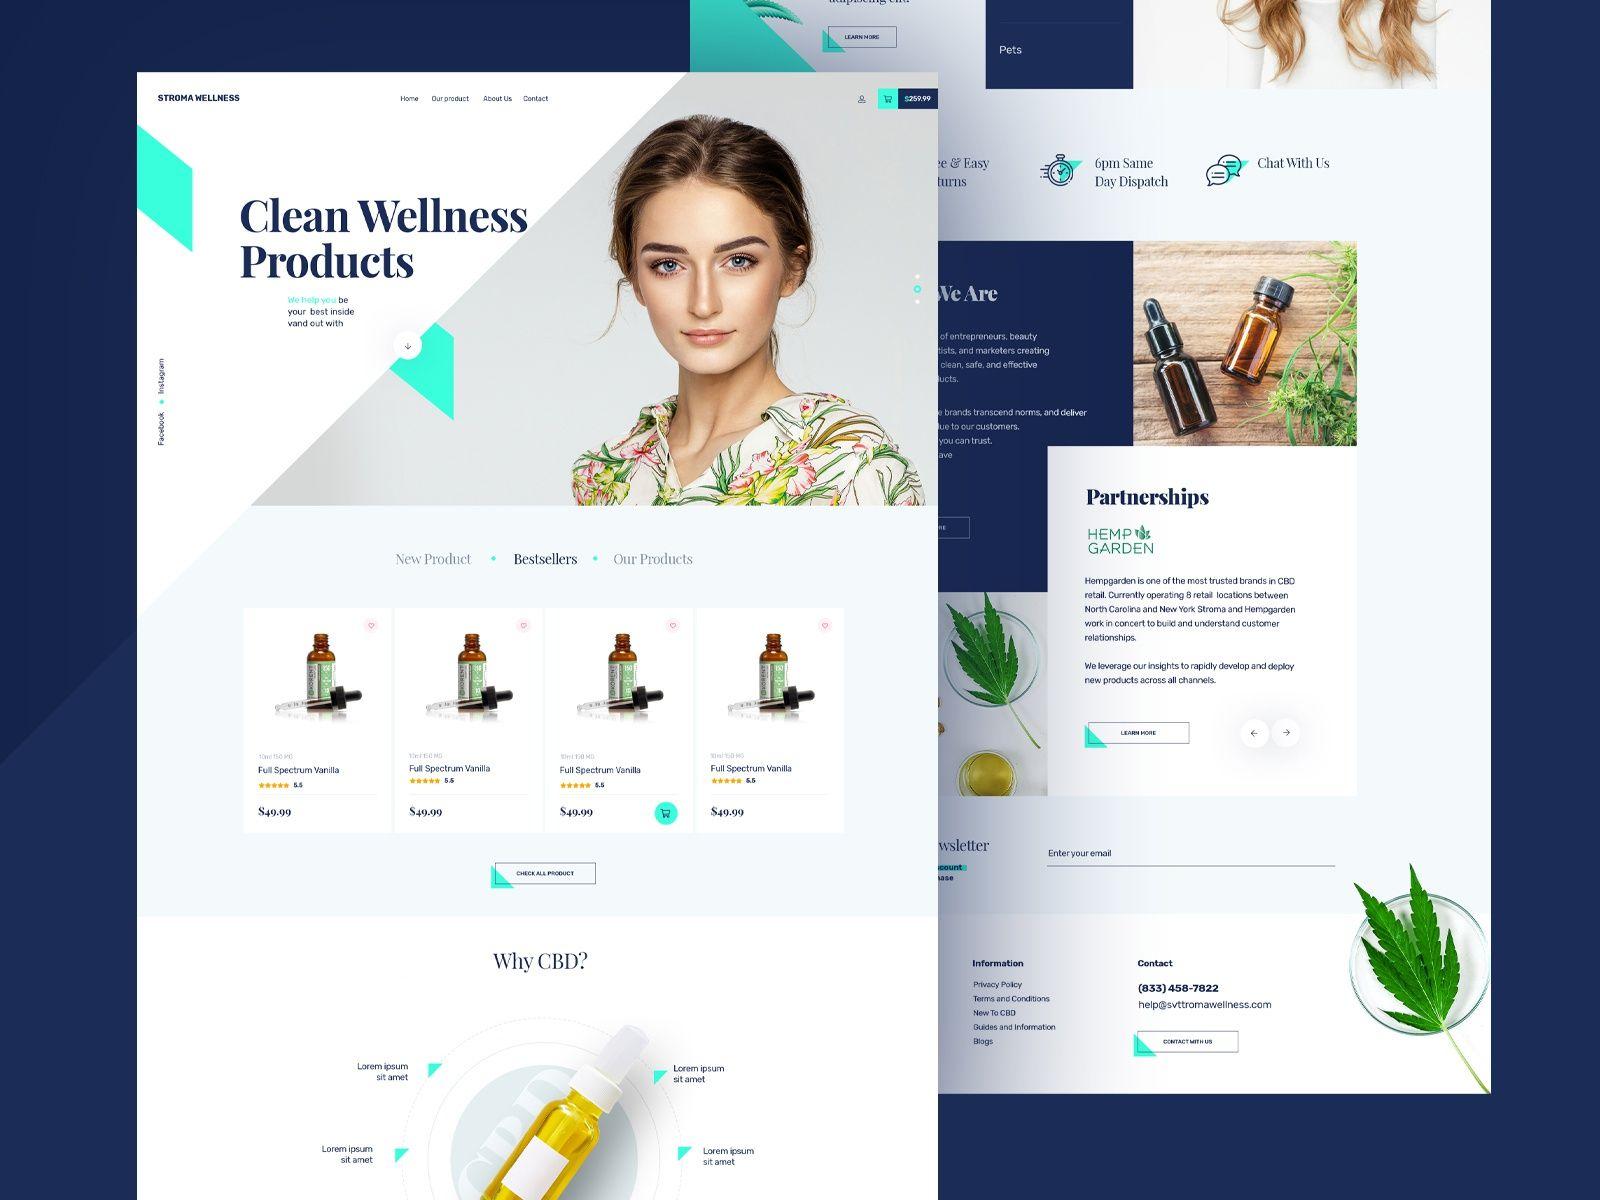 Cbd Marketing Company Web Mock Up In 2020 Website Design Website Design Mockup Medical Website Design